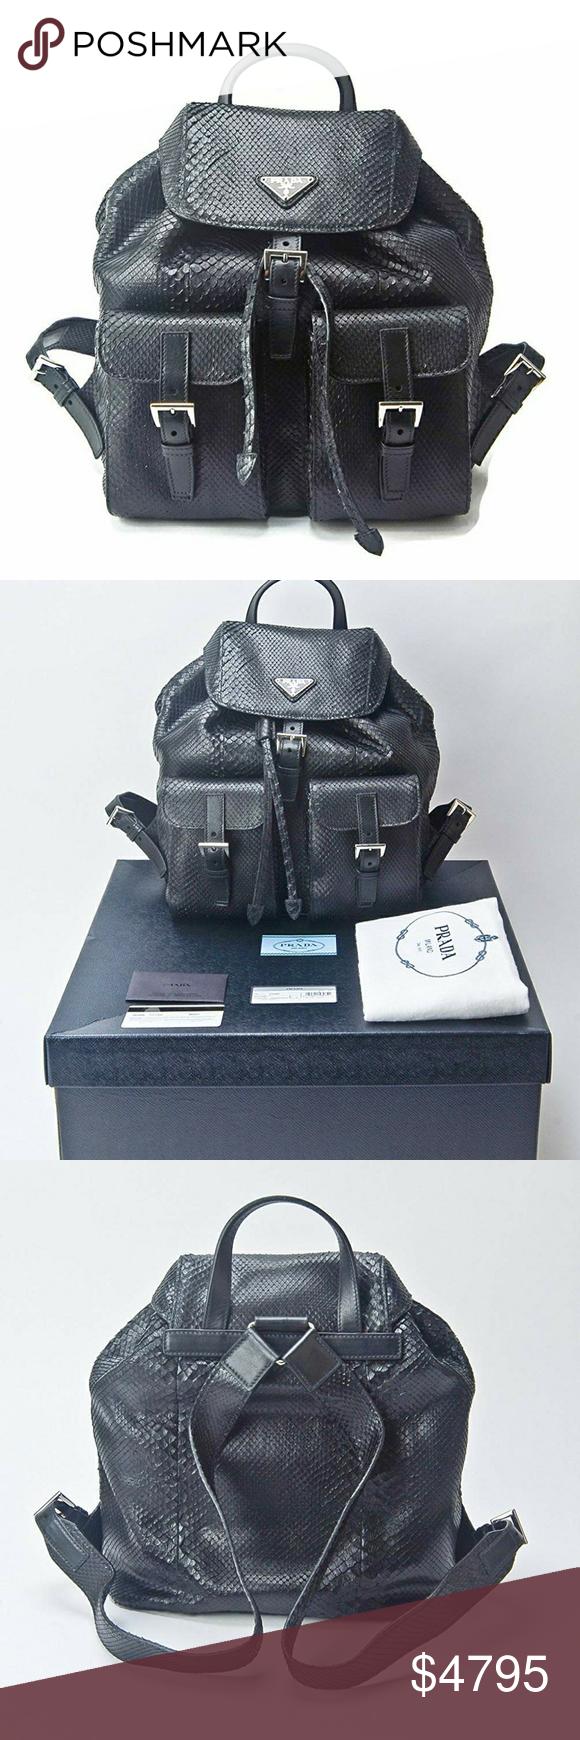 84a3db1b3122 Prada Black Genuine Python Snake Skin Backpack Prada Impossible To Find Black  Genuine Python Snake Skin Backpack Purse Bag - Current Season Sold Out Prada  ...